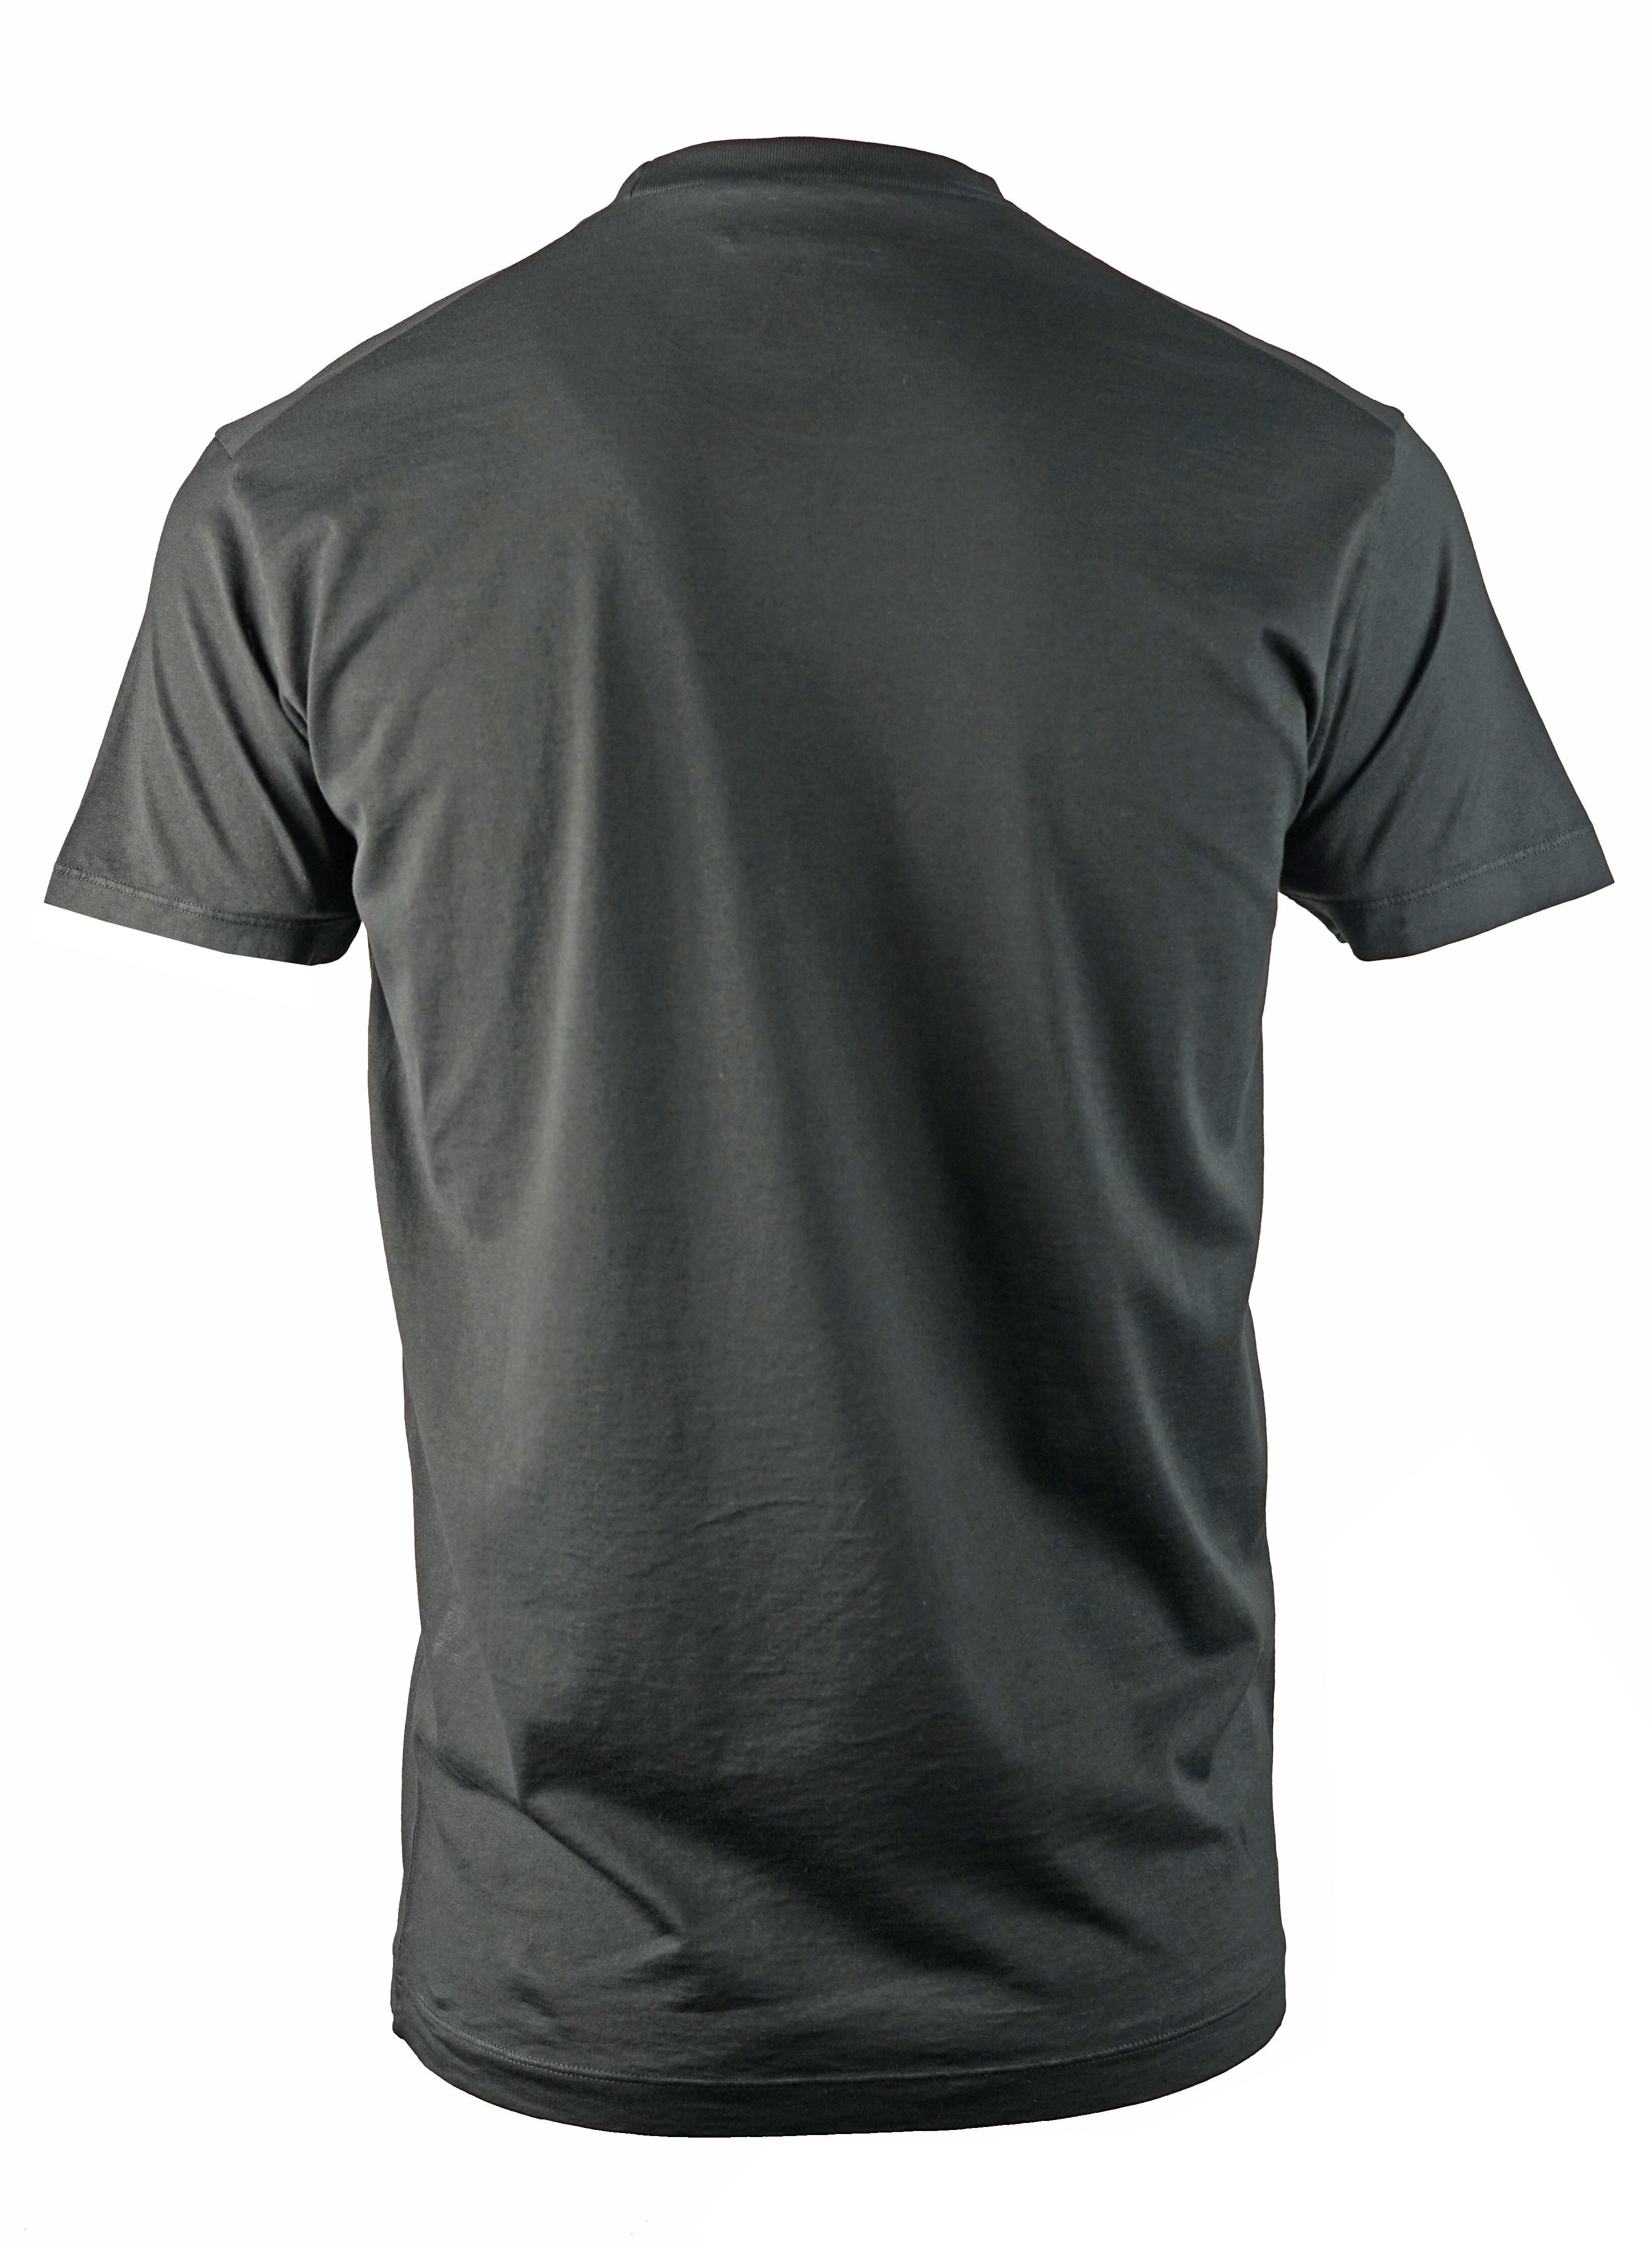 DSquared2 S74GD0484 S22844 900 T-Shirt